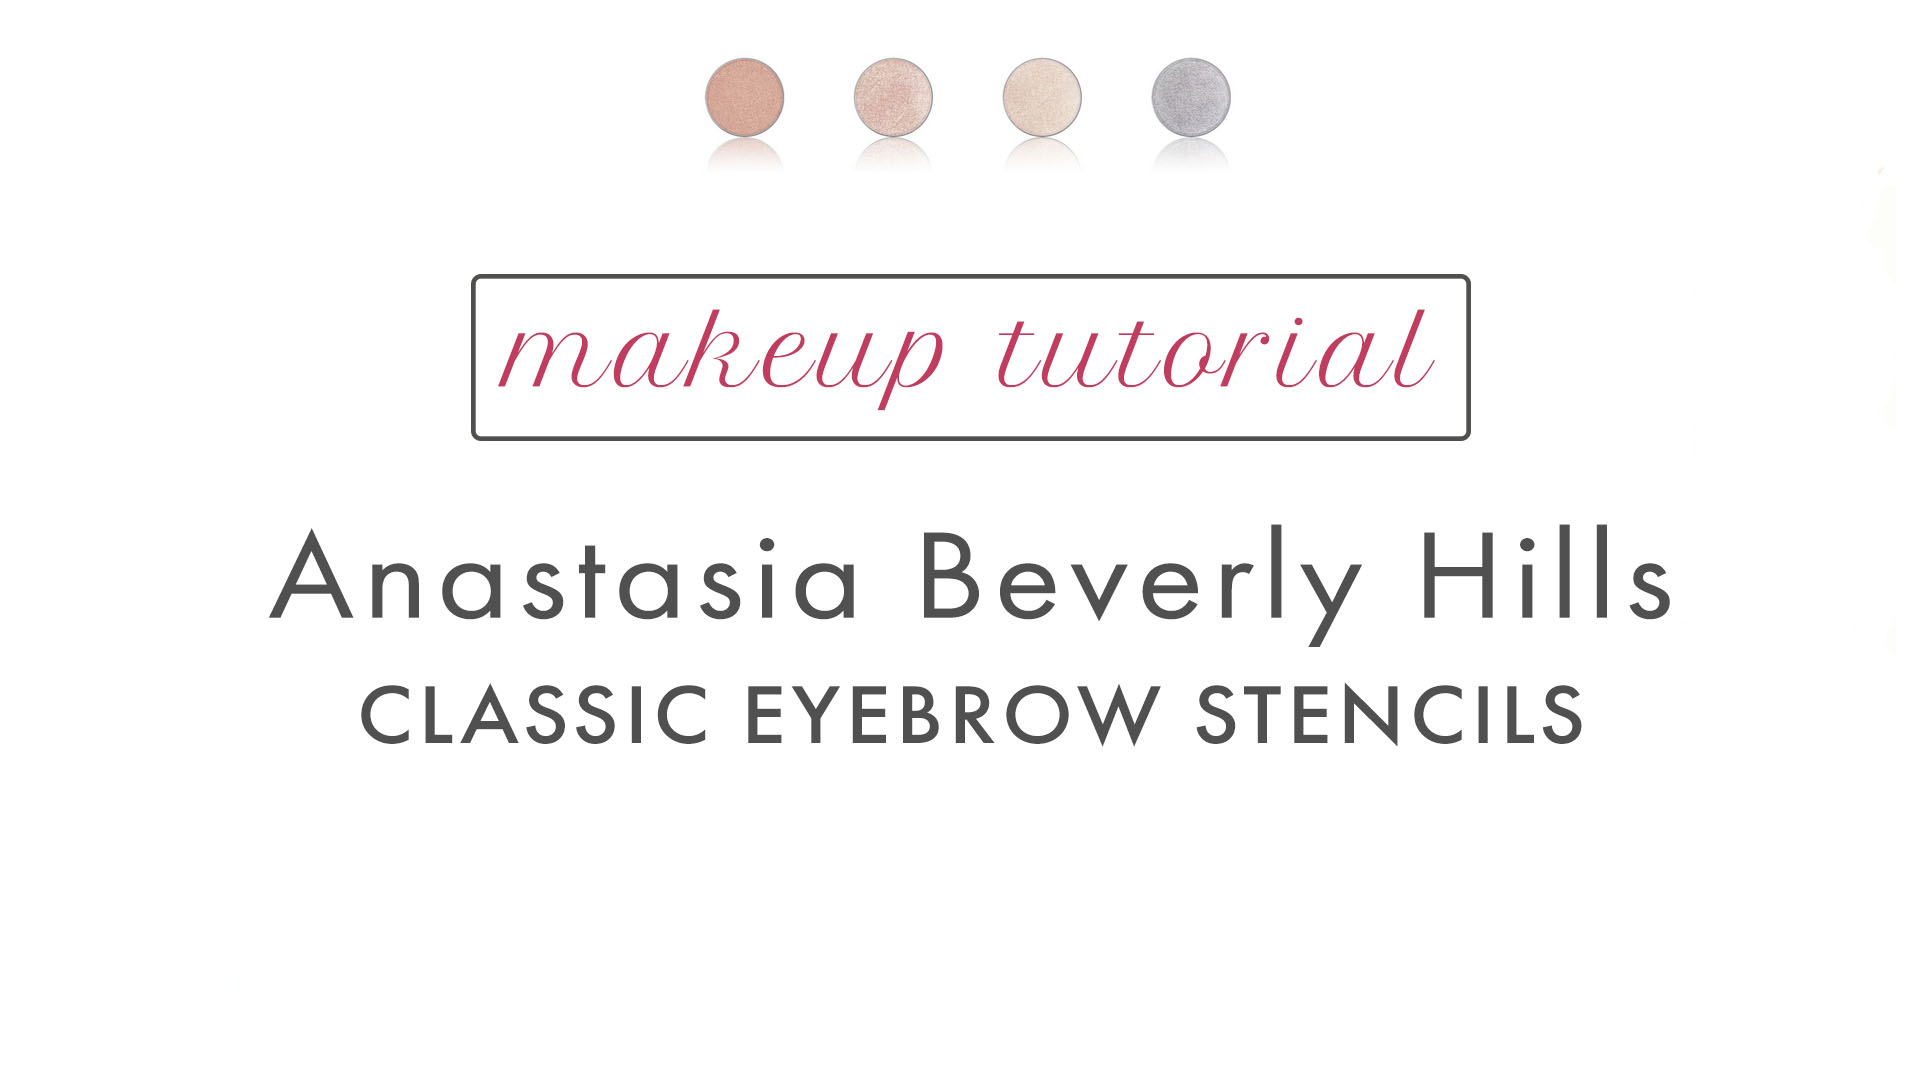 Anastasia Beverly Hills Classic Eyebrow Stencil Organic Natural